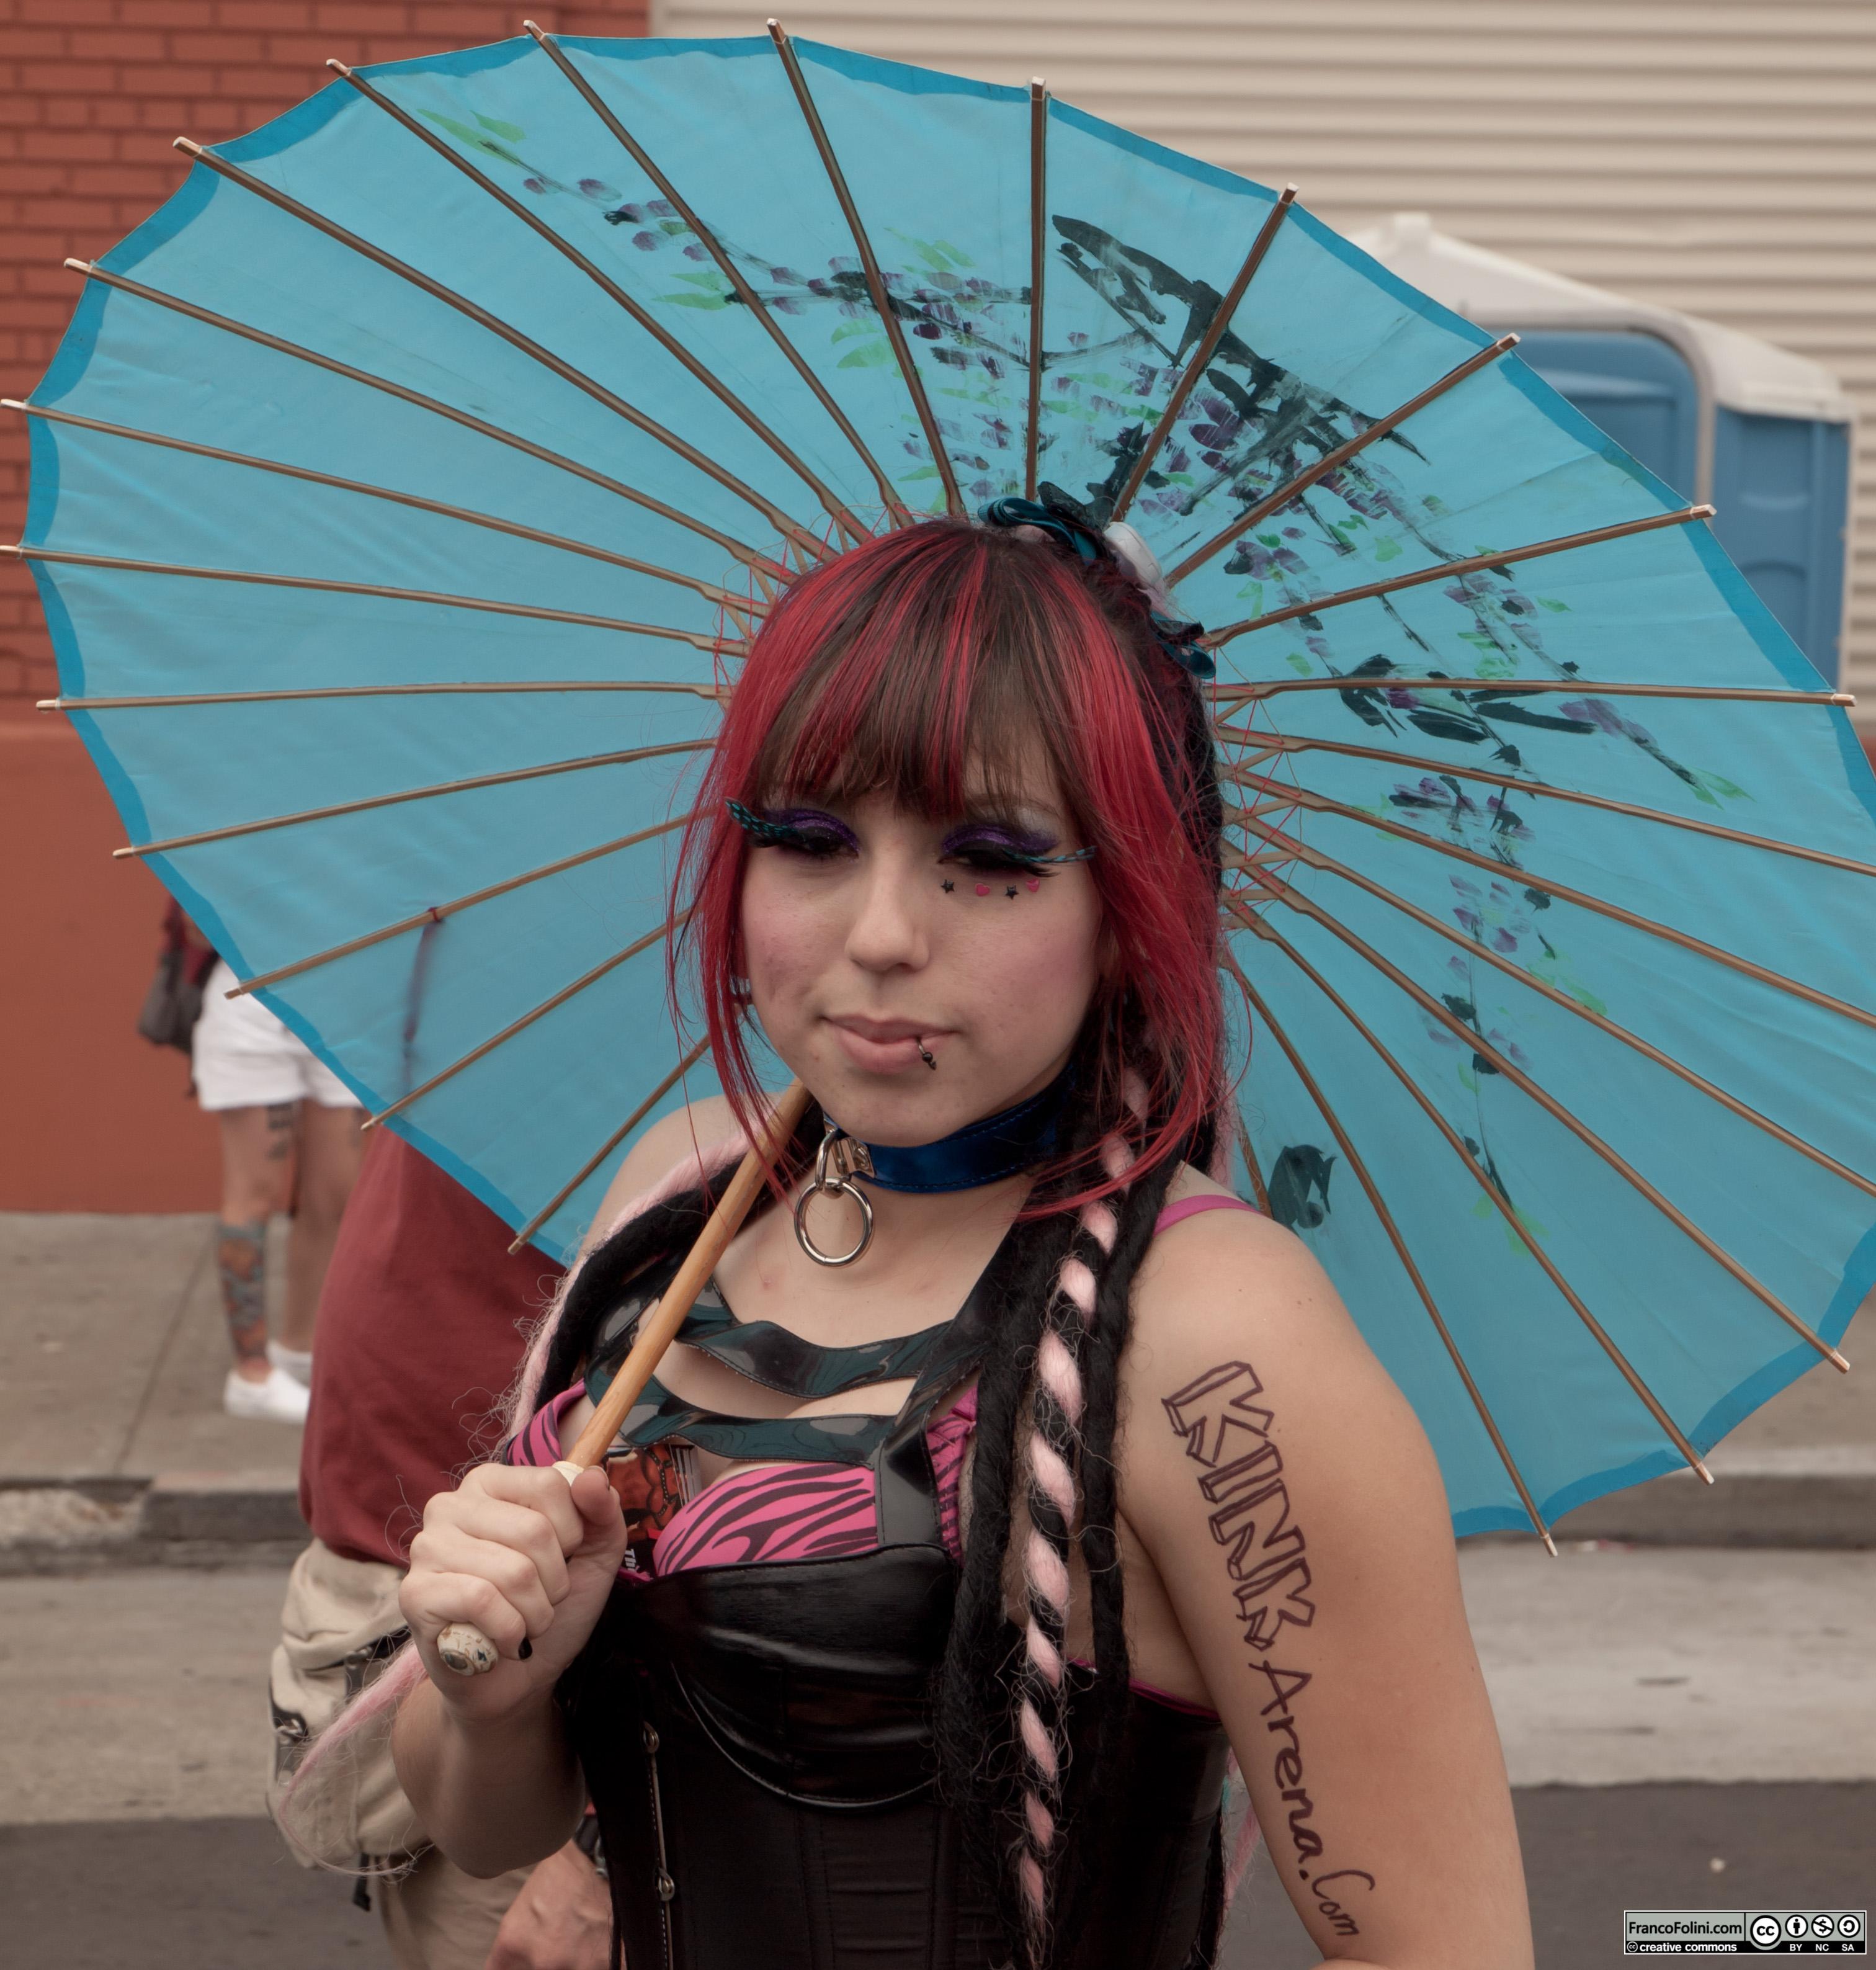 San Francisco Folsom Street Fair: girl with umbrella